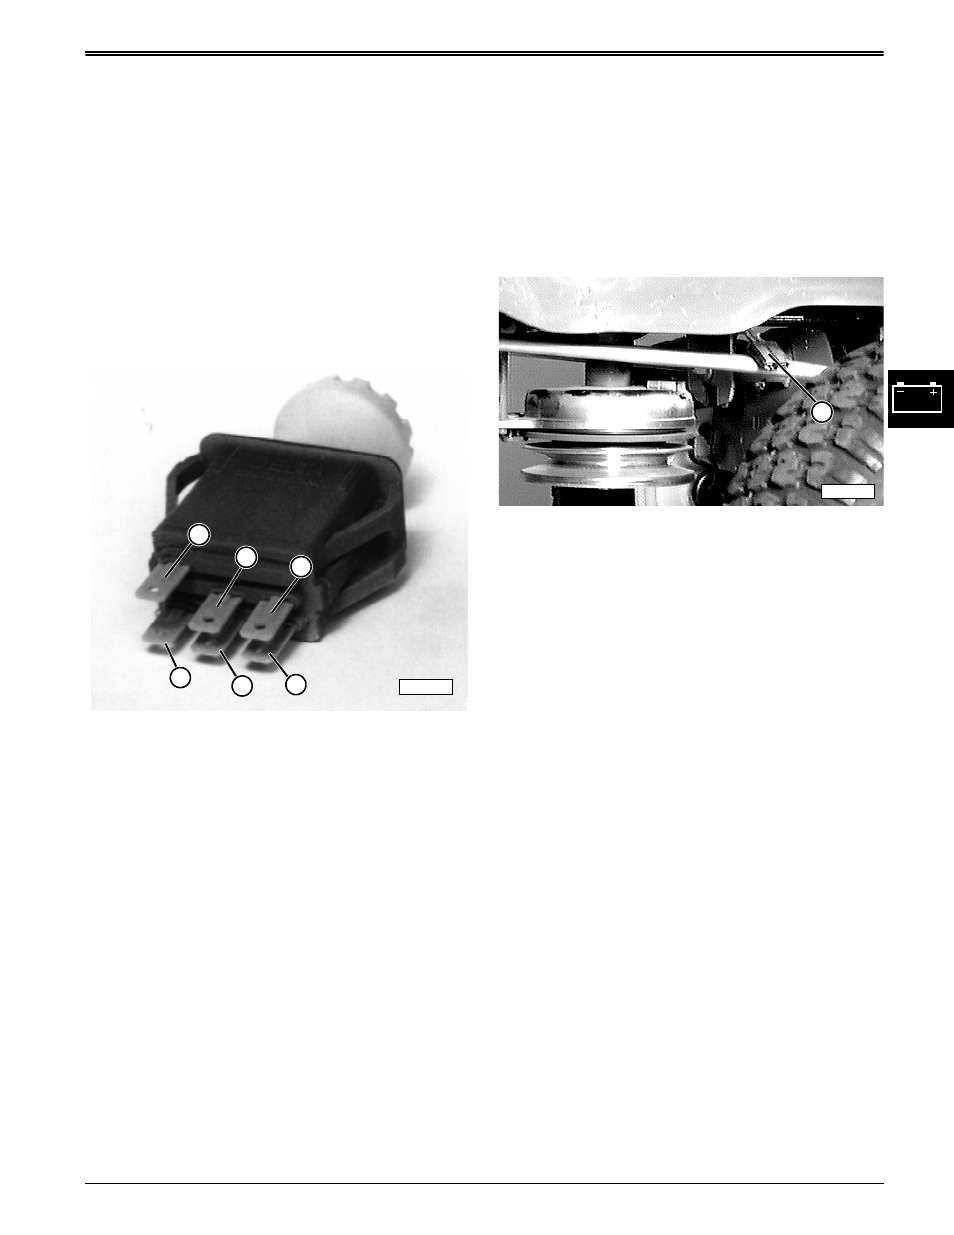 L118 Wiring Diagram Reveolution Of John Deere Harness Lt155 Parts Deck